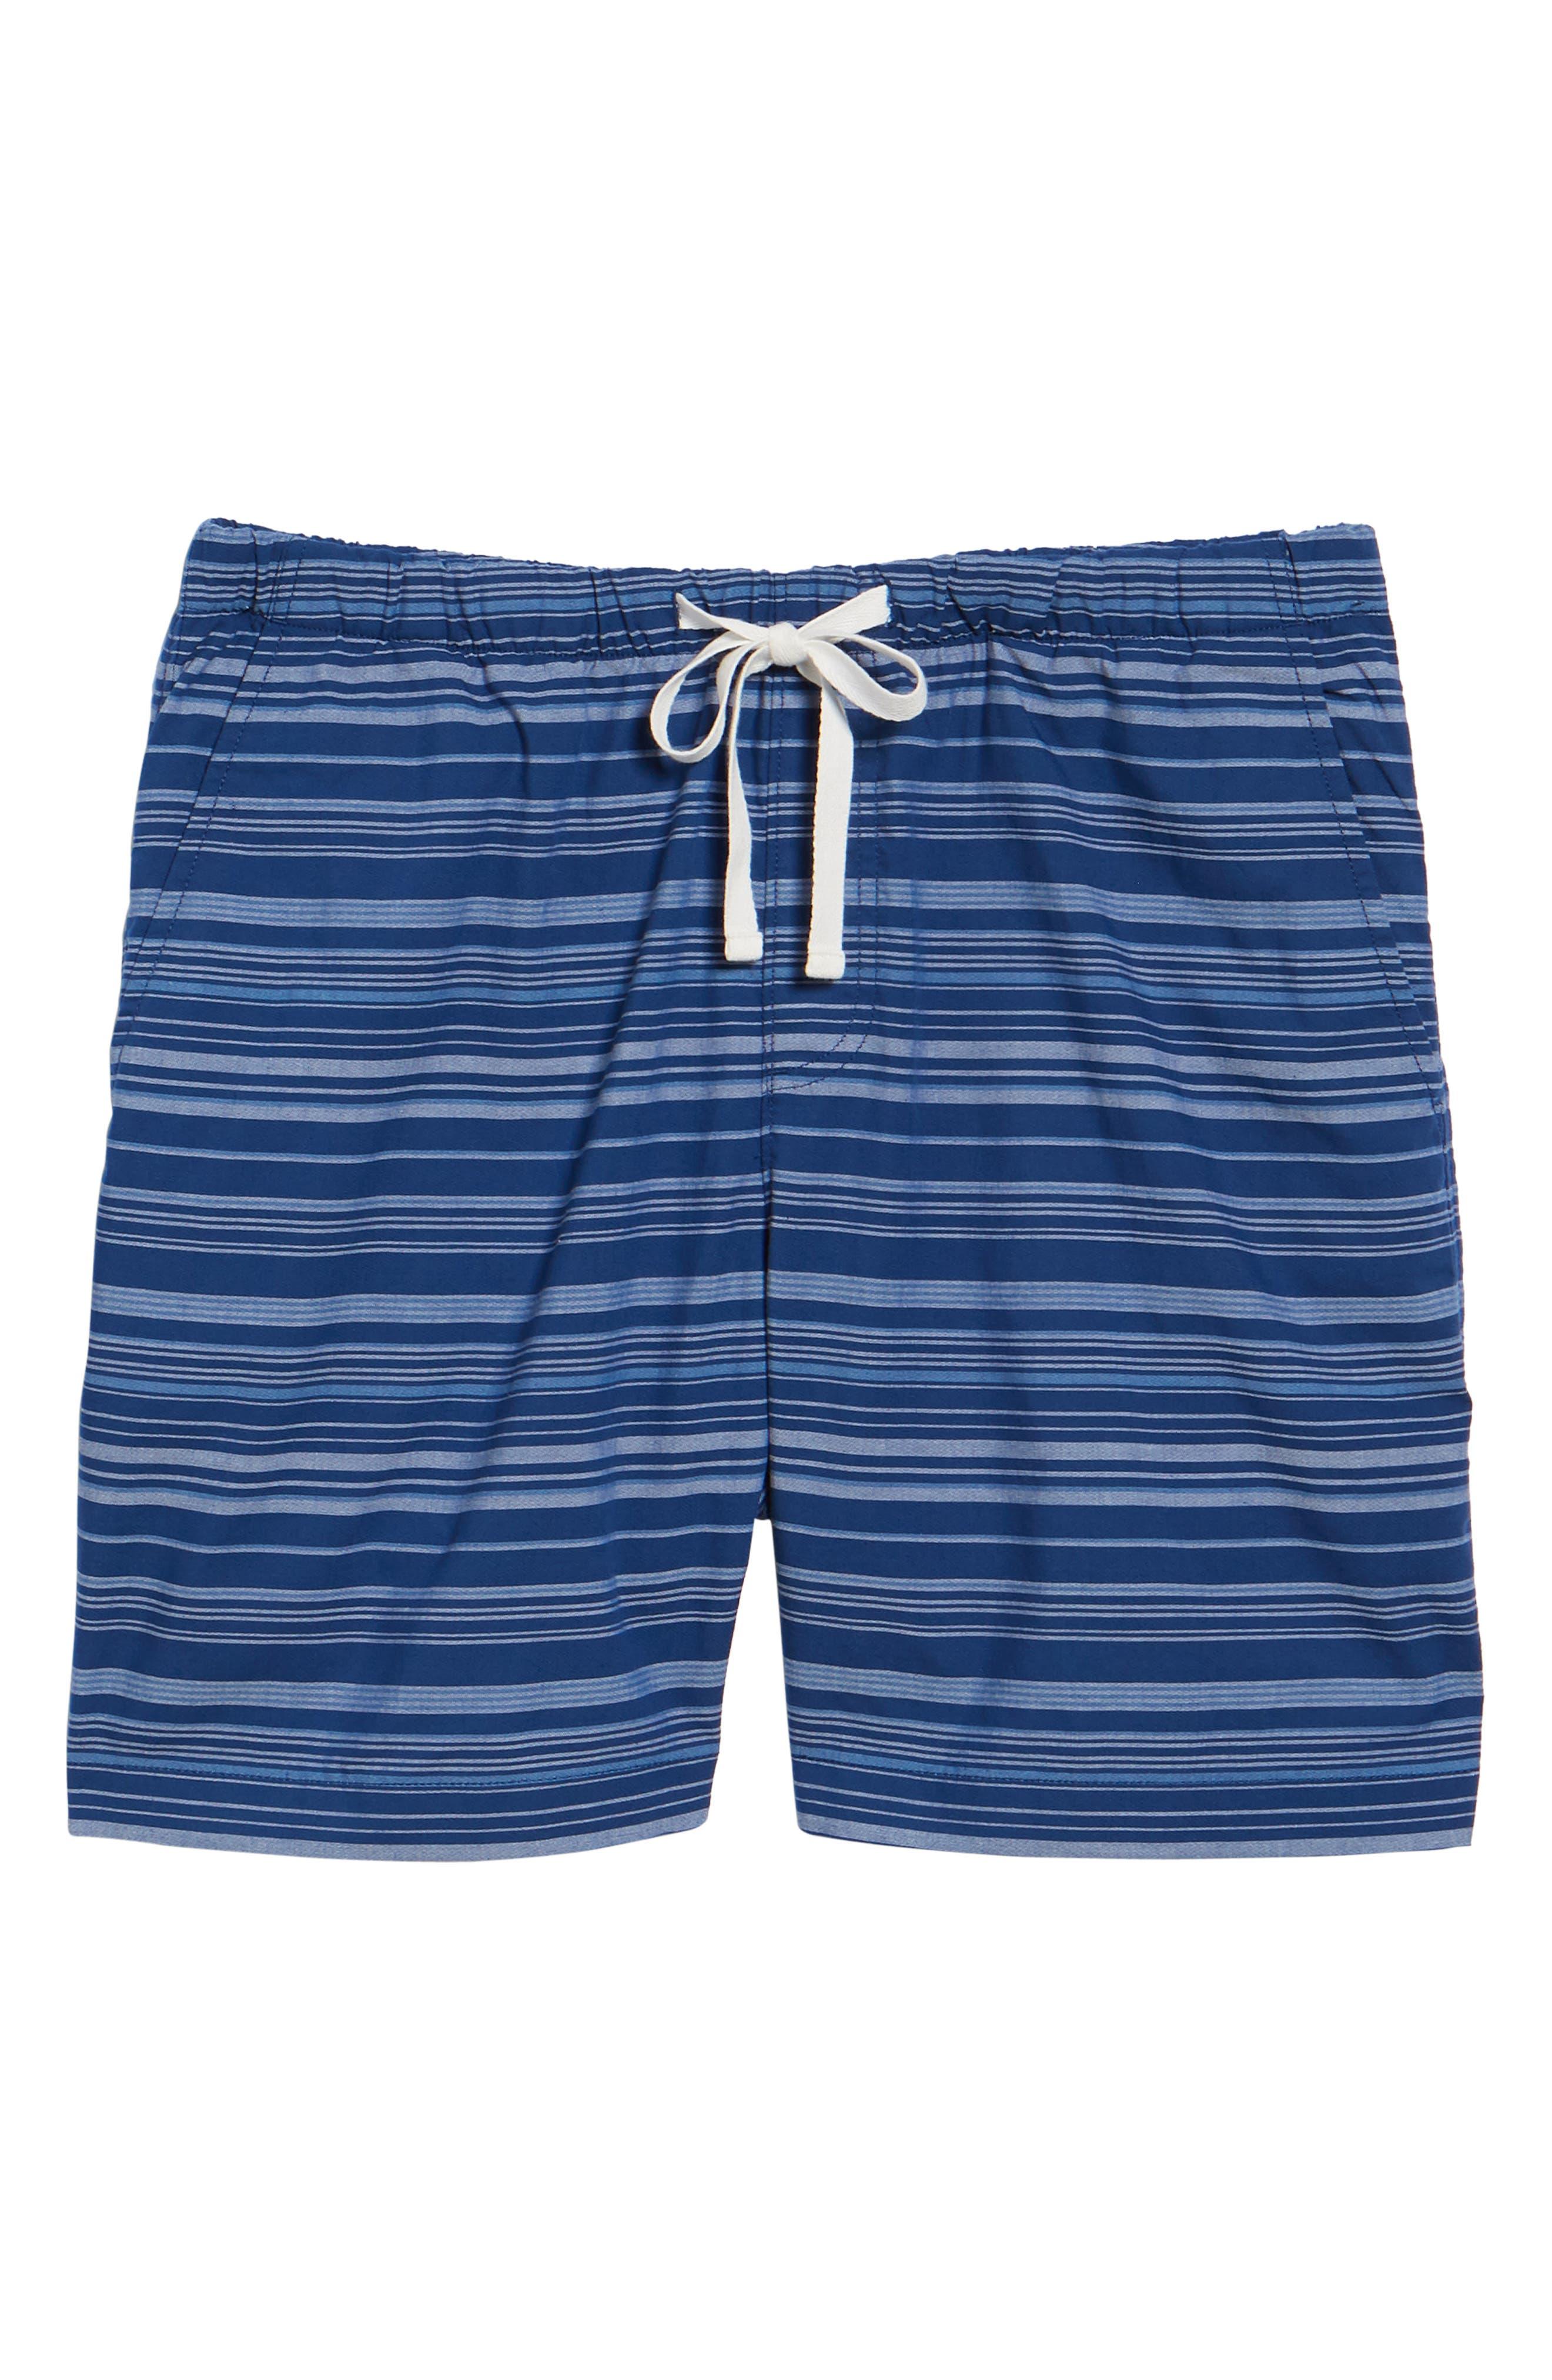 Hammock Board Shorts,                             Alternate thumbnail 6, color,                             Seven Seas Blue